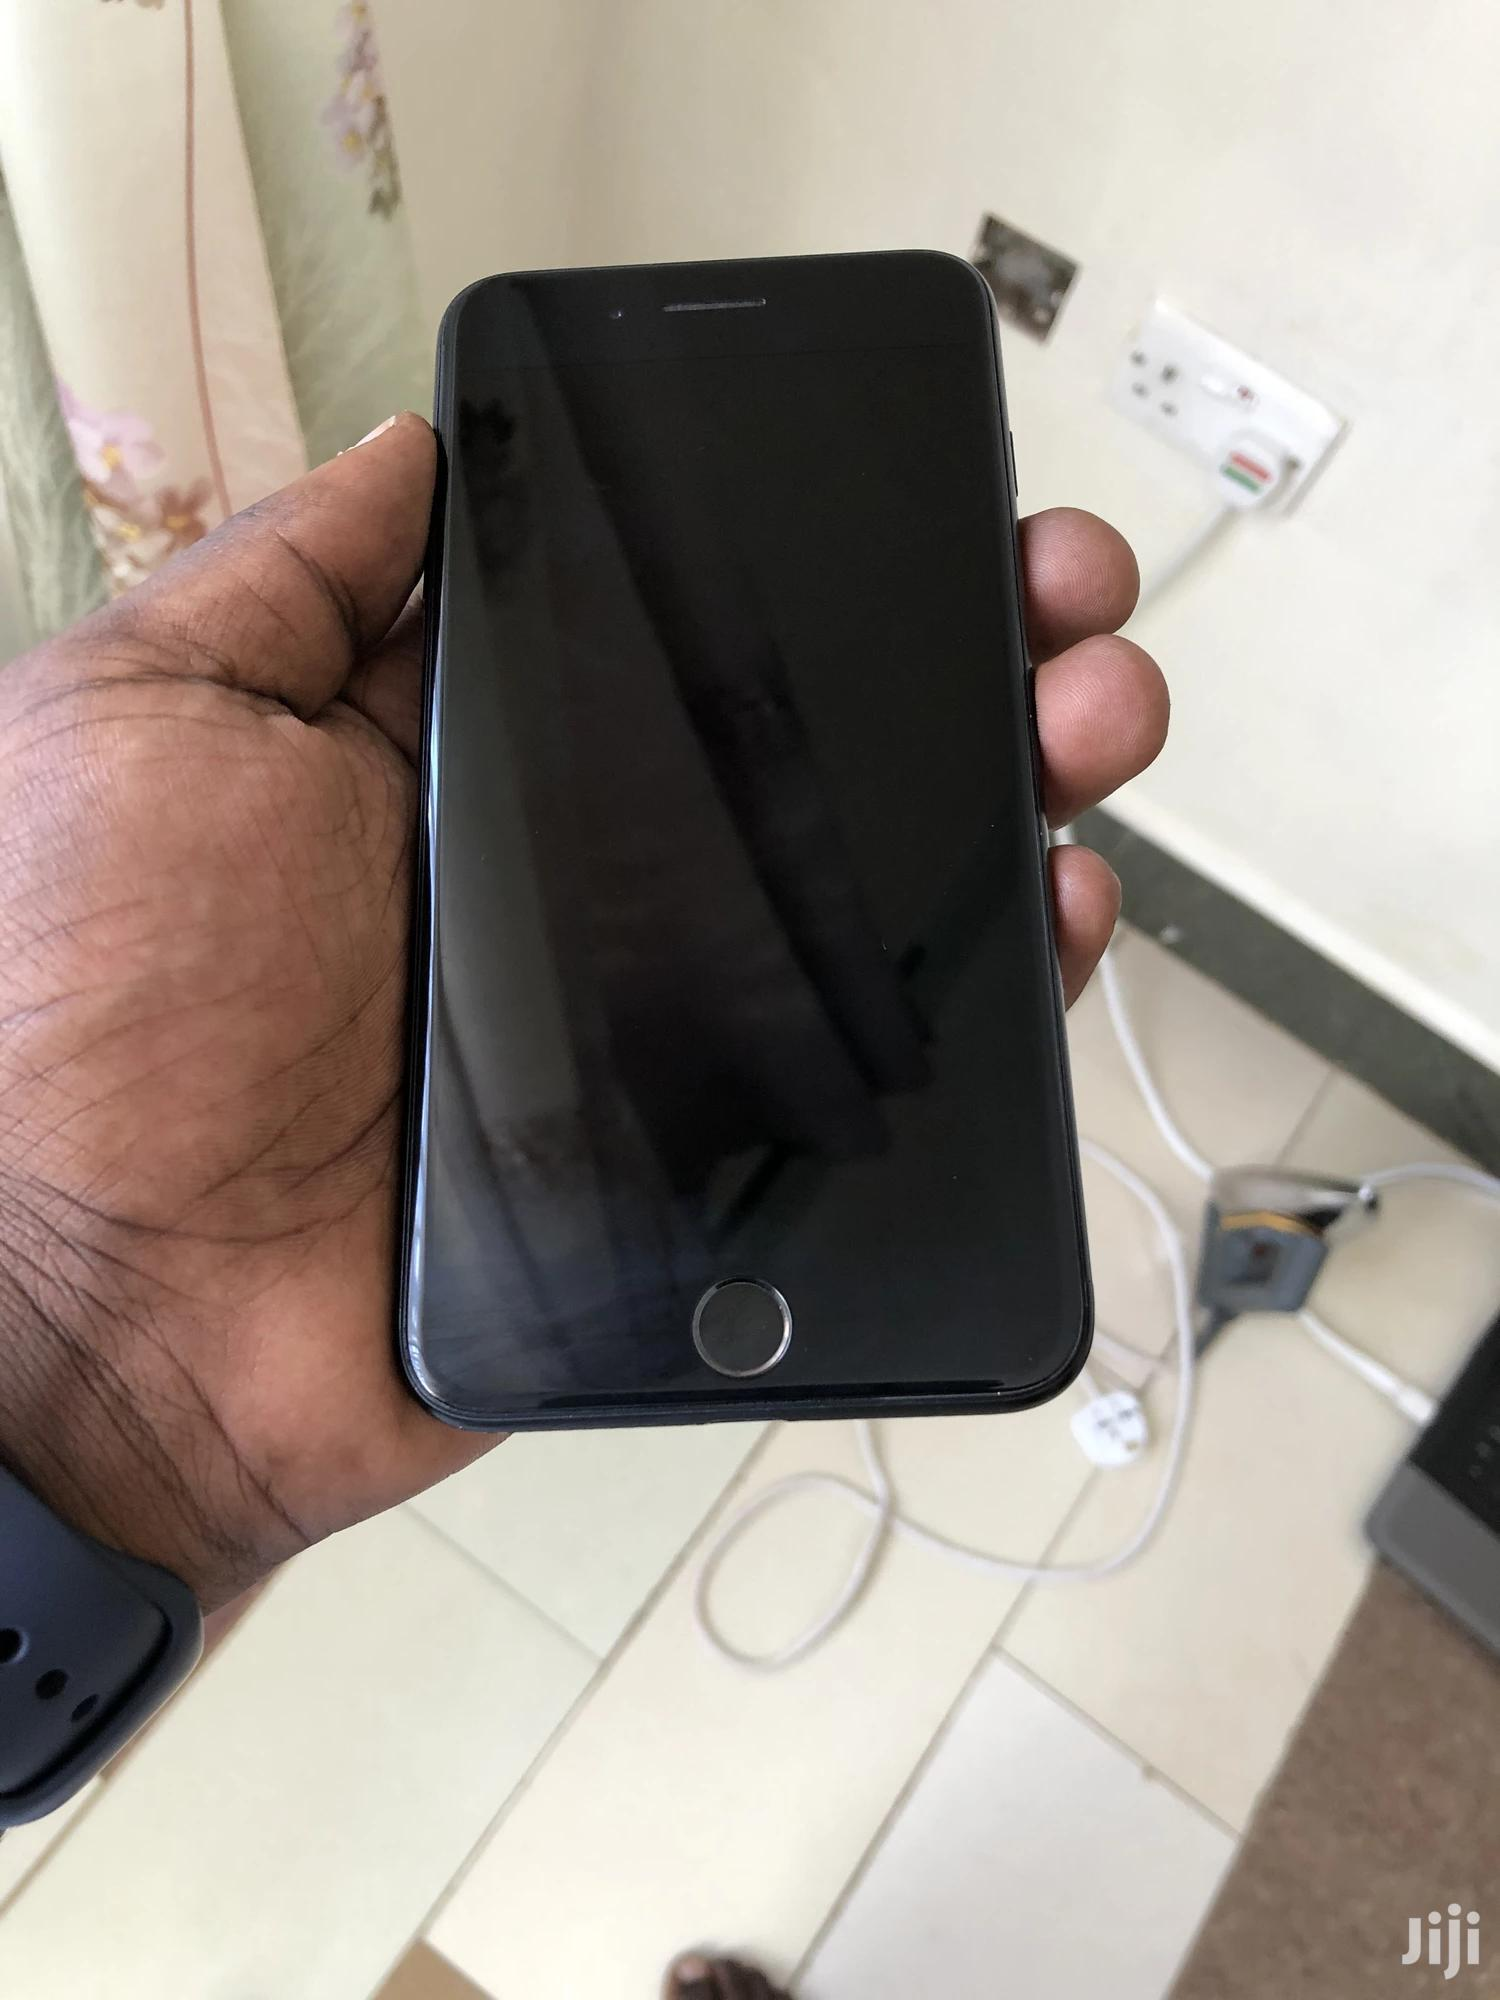 Apple iPhone 7 Plus 32 GB Black   Mobile Phones for sale in Kampala, Central Region, Uganda